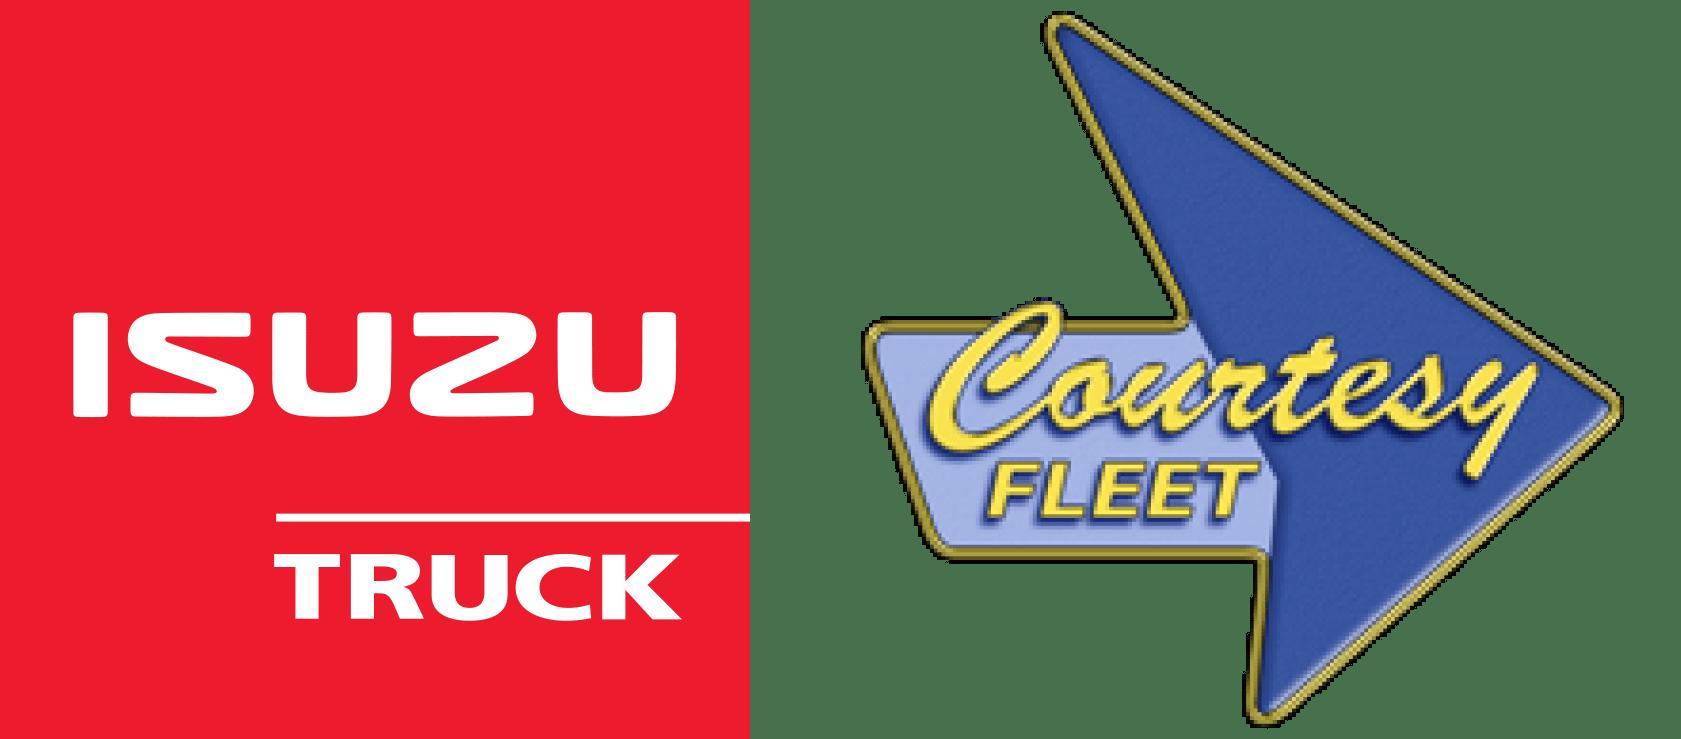 Courtesy Fleet Isuzu